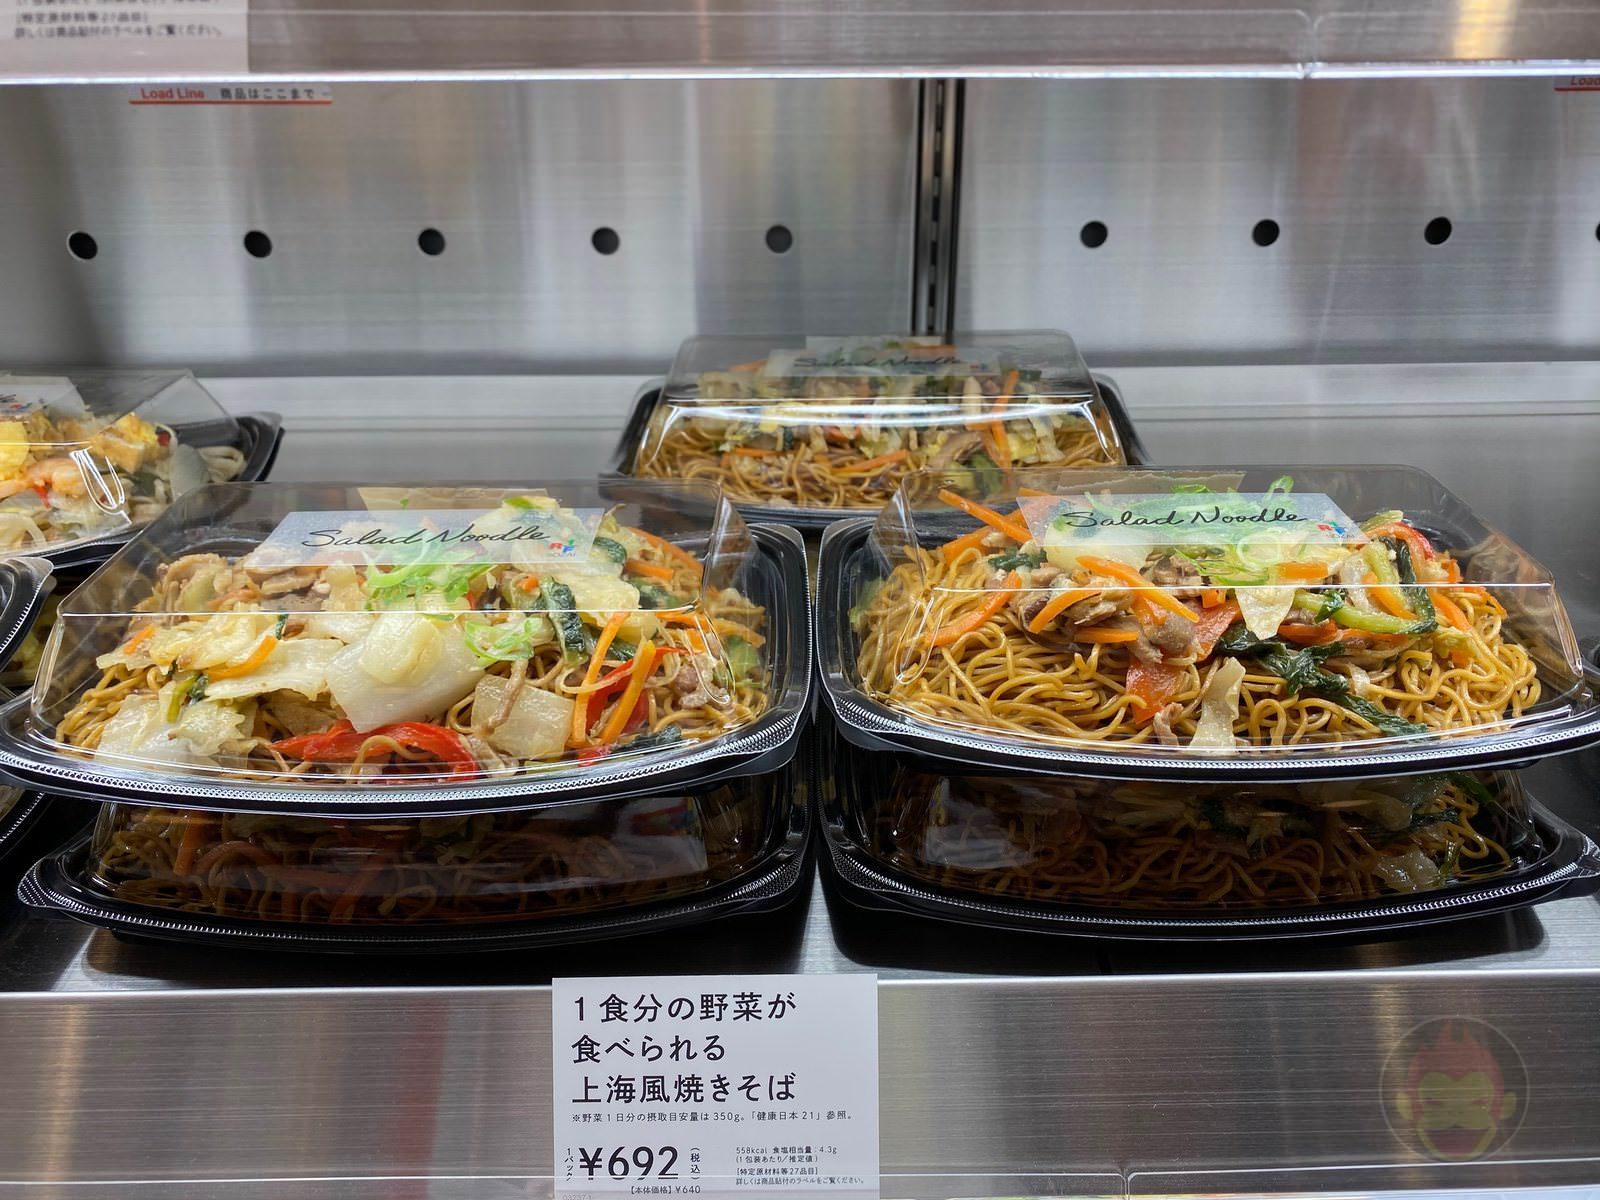 Shibuya-Scramble-Square-Food-I-Ate-137.jpeg